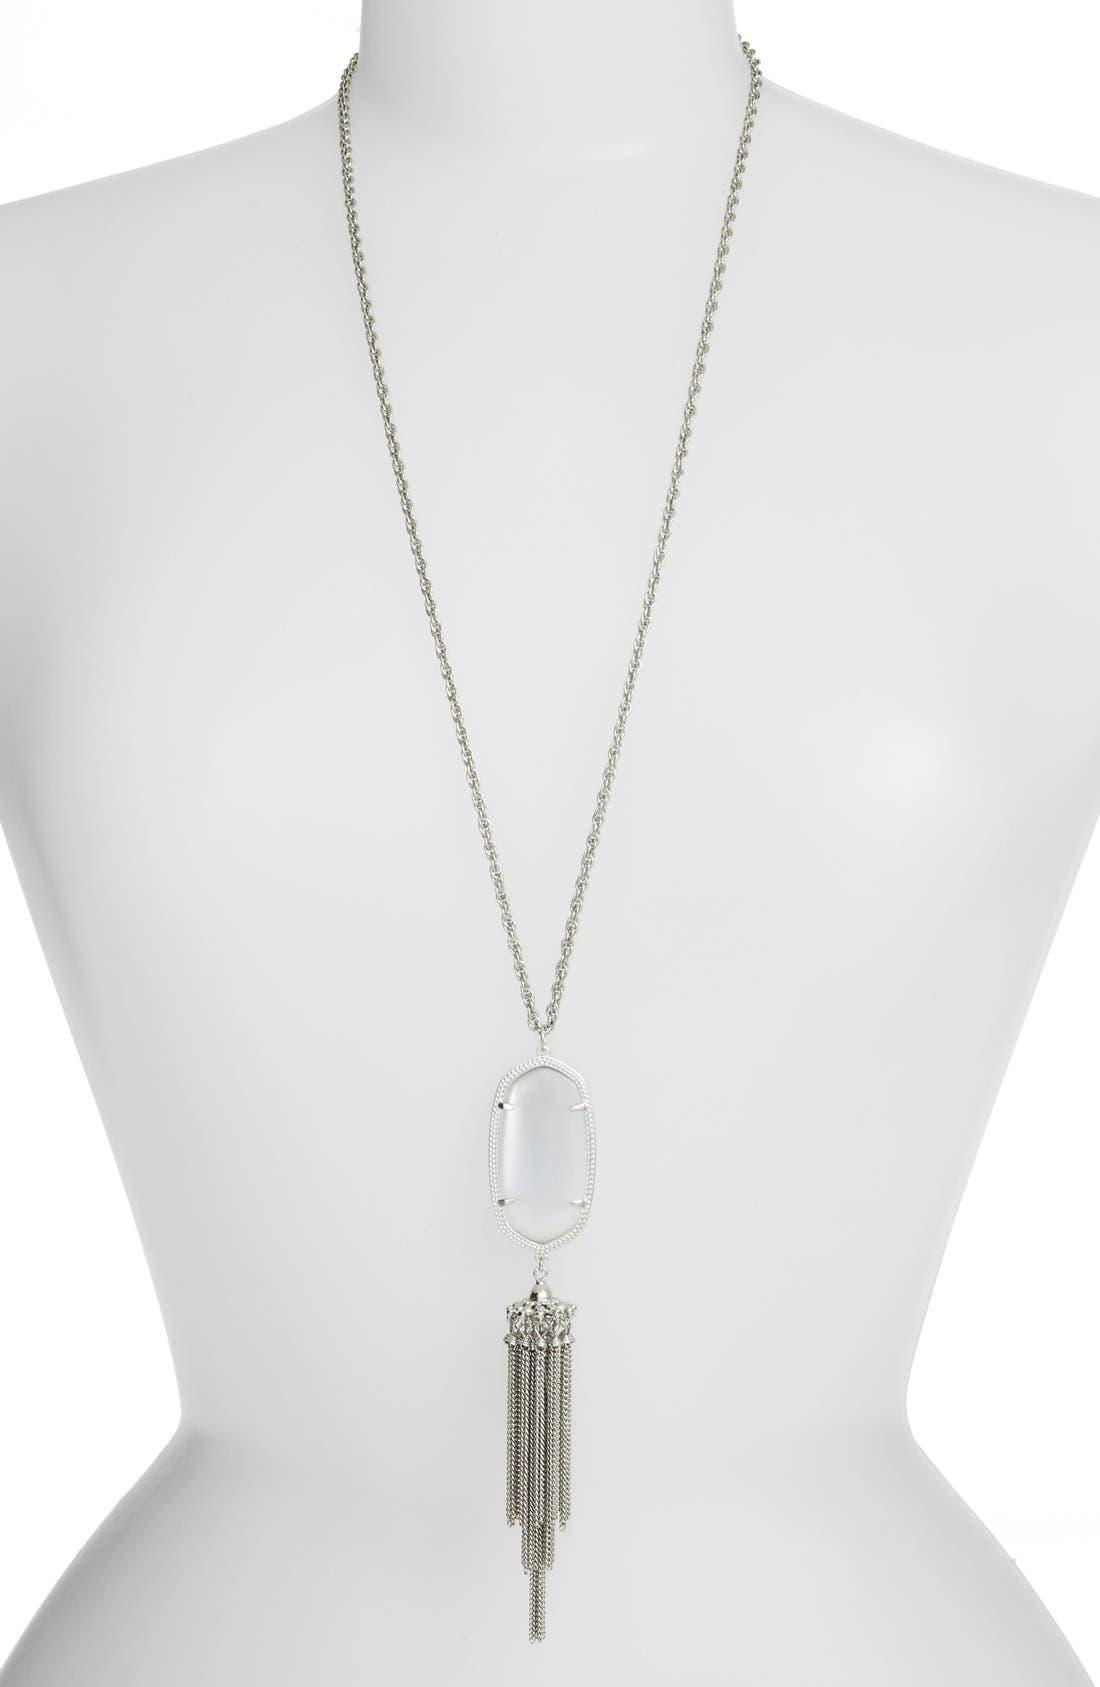 Kendra Scott 'Rayne' Tassel Pendant Necklace